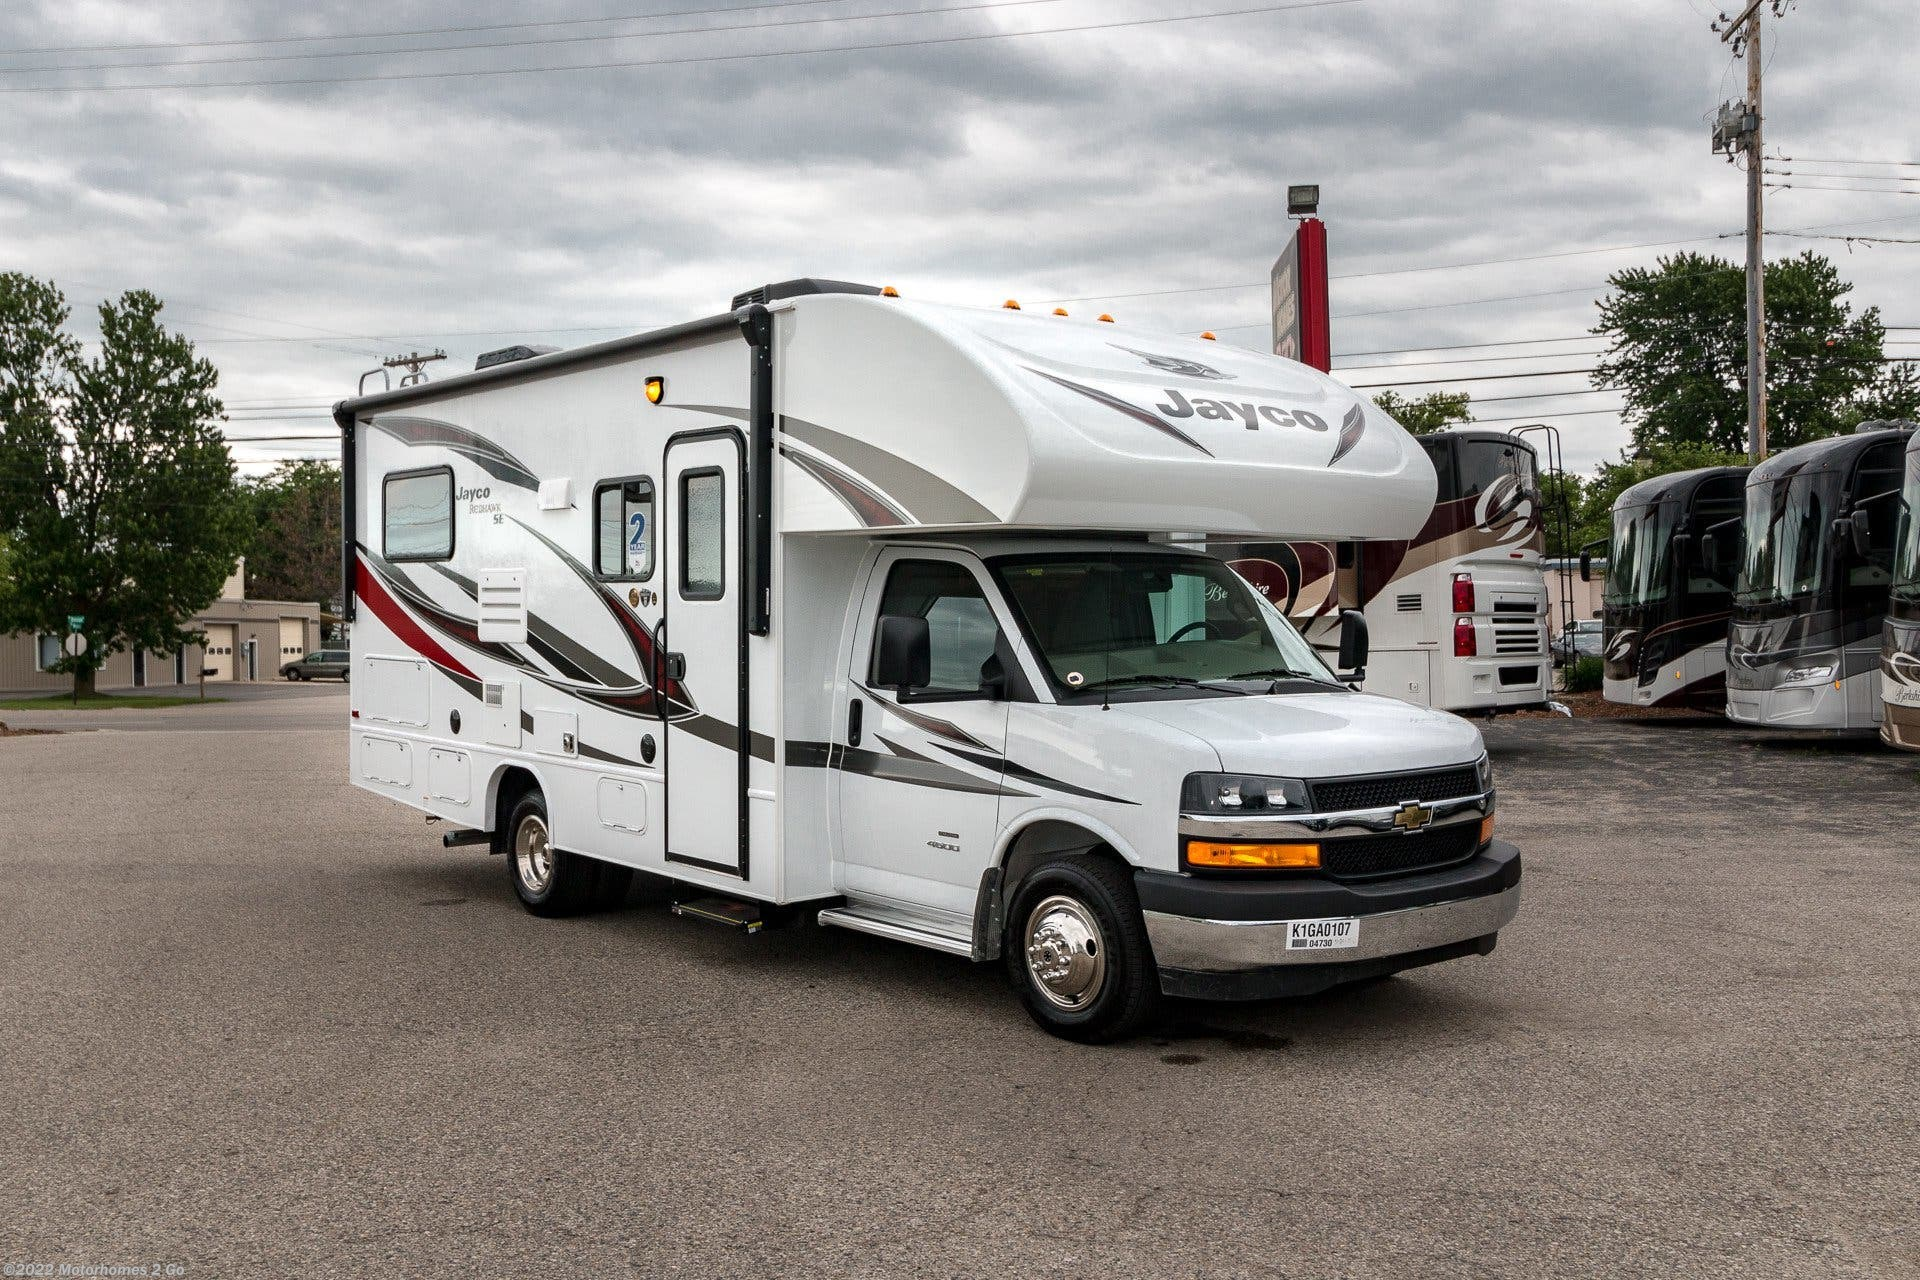 2019 Jayco RV Redhawk SE 22A for Sale in Grand Rapids, MI 49548 | 34777